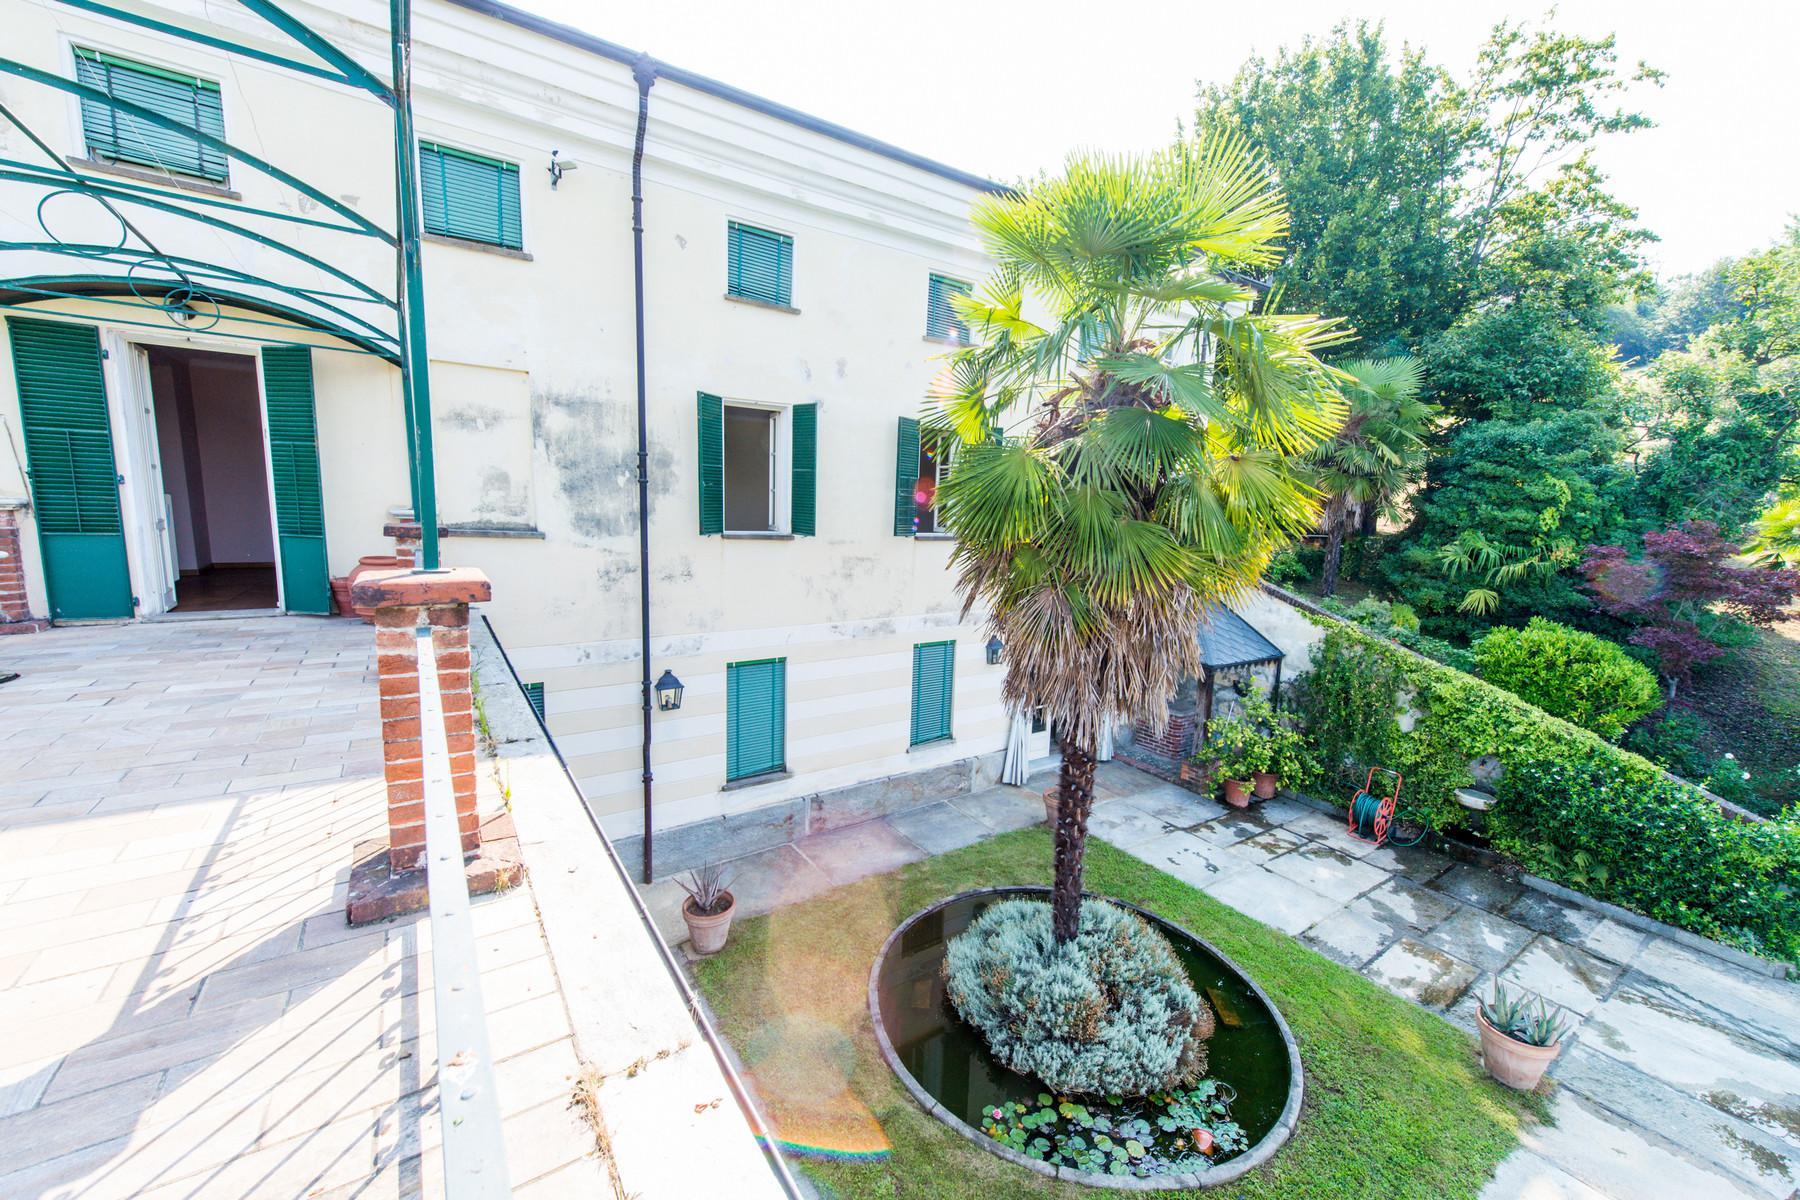 Splendid villa with winery in Piedmont - 22